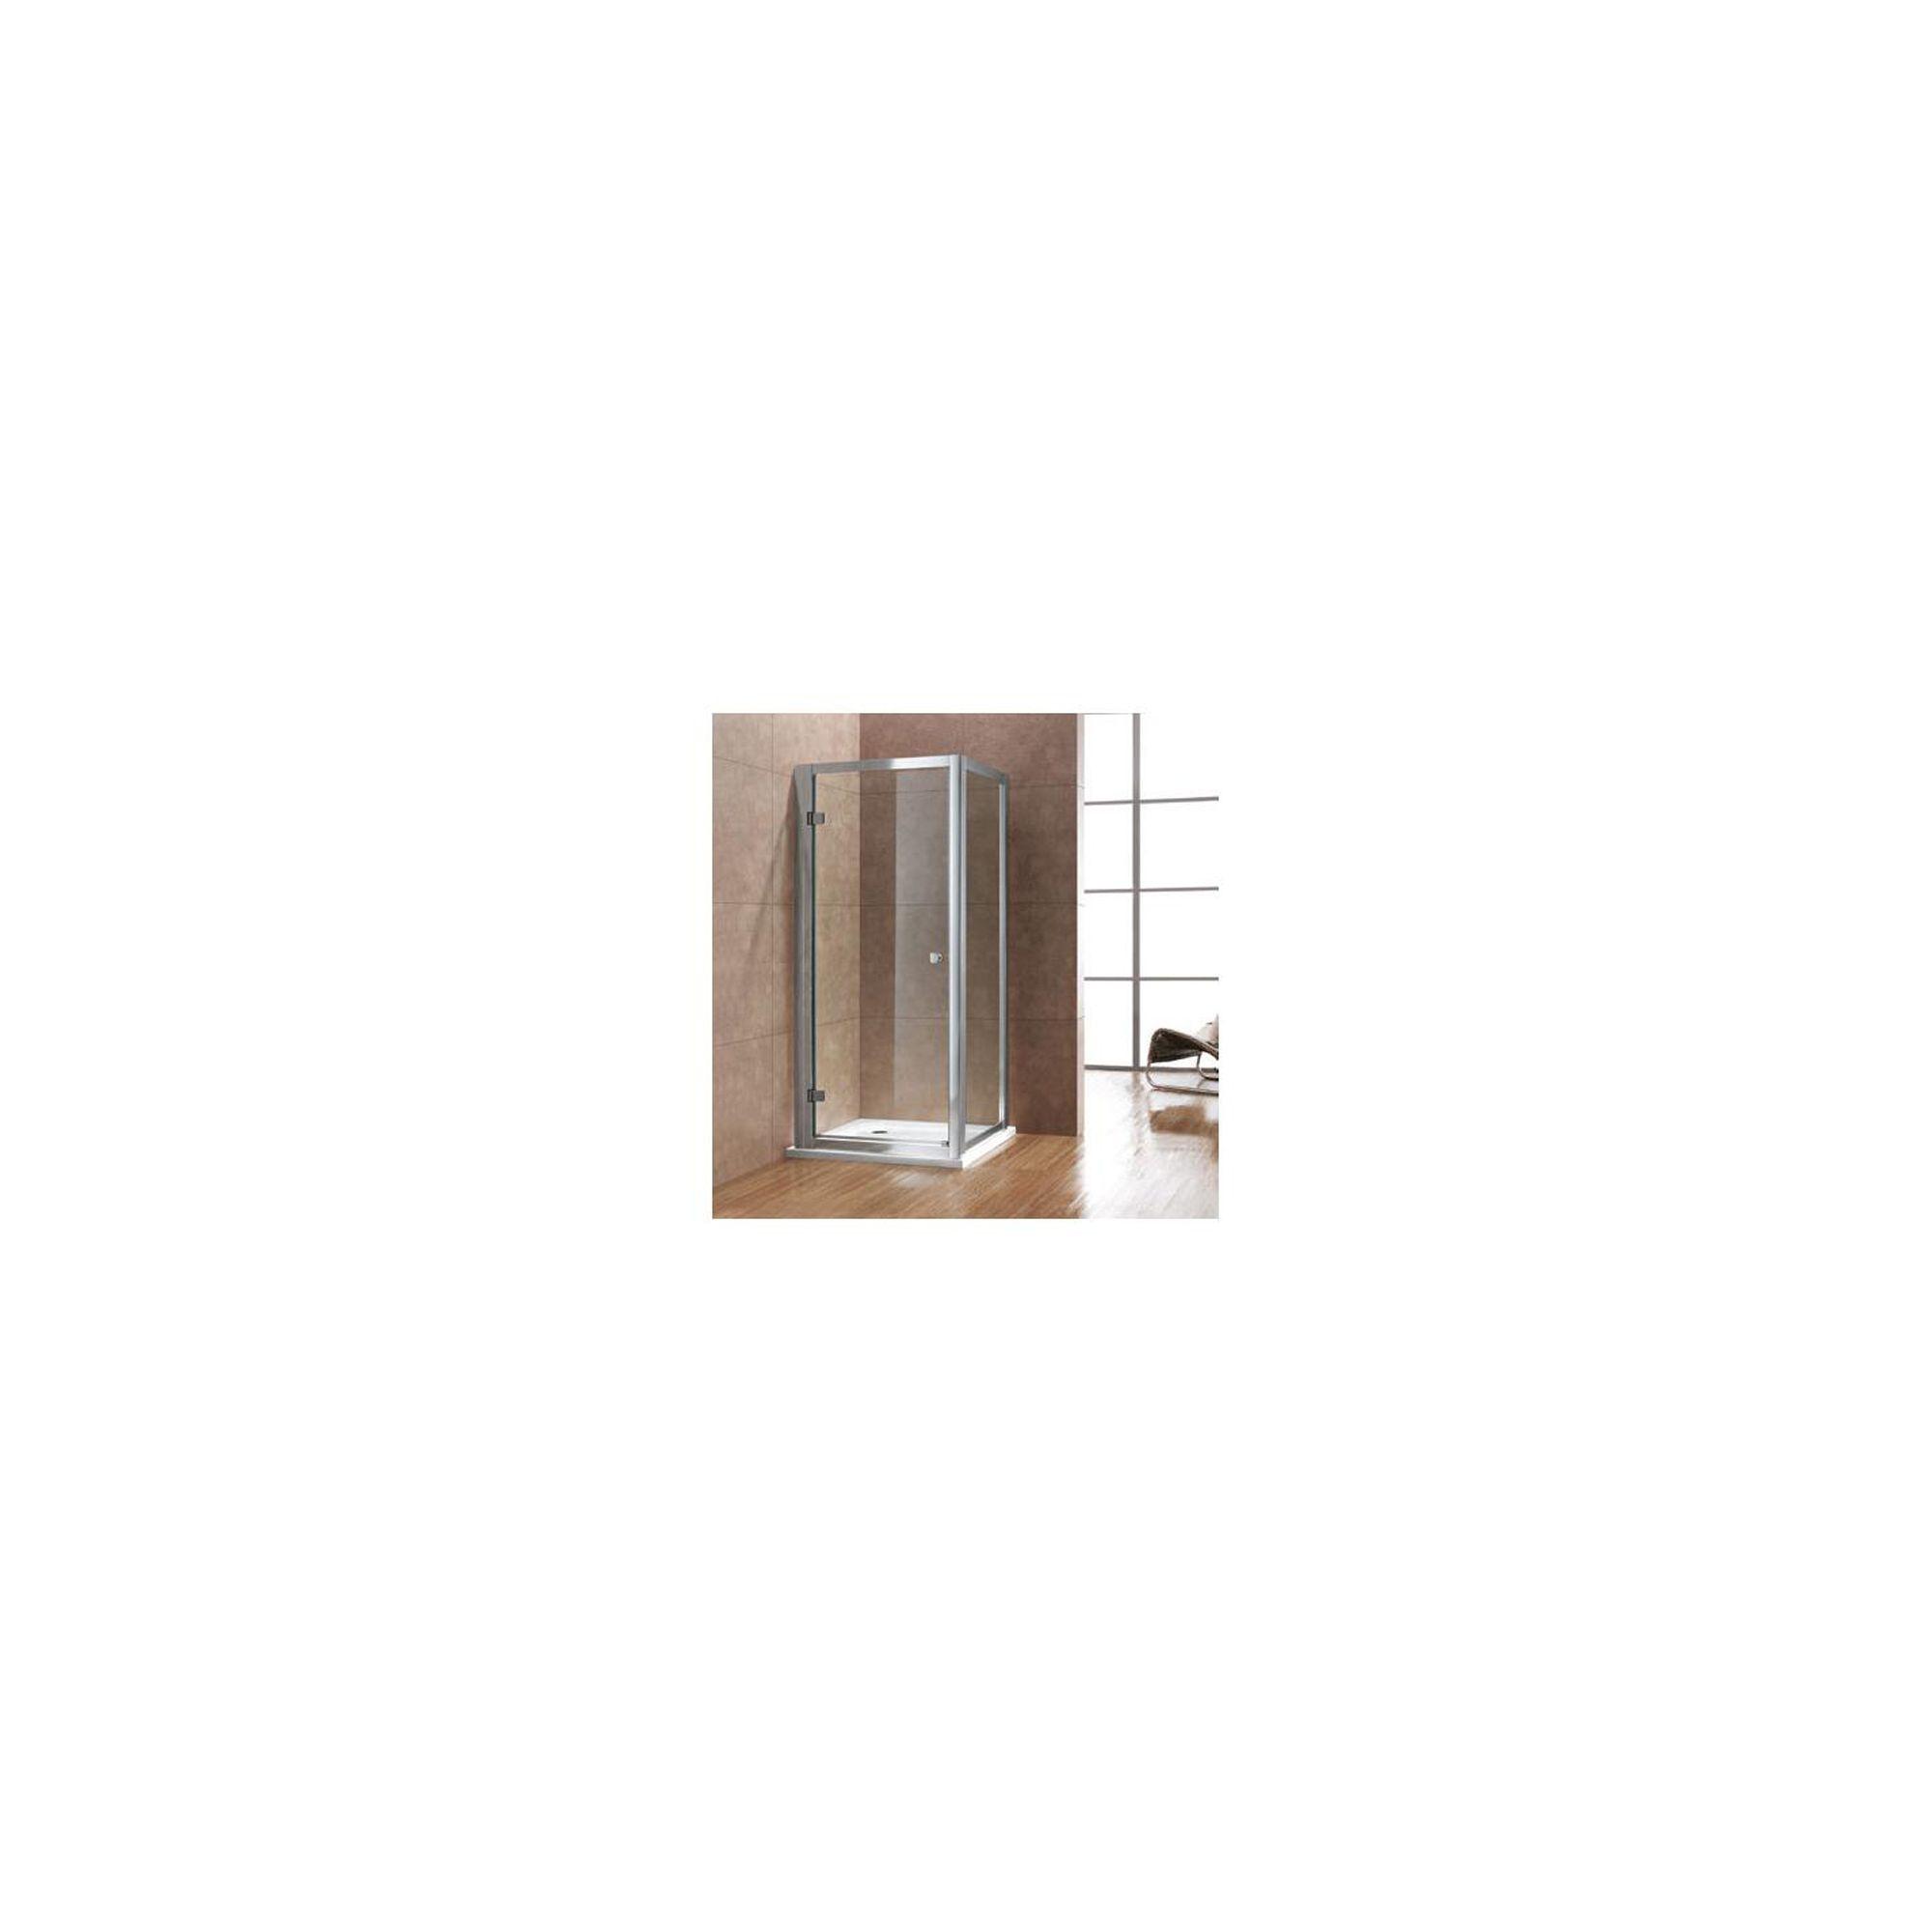 Duchy Premium Hinged Shower Door, 900mm Wide, 8mm Glass at Tesco Direct